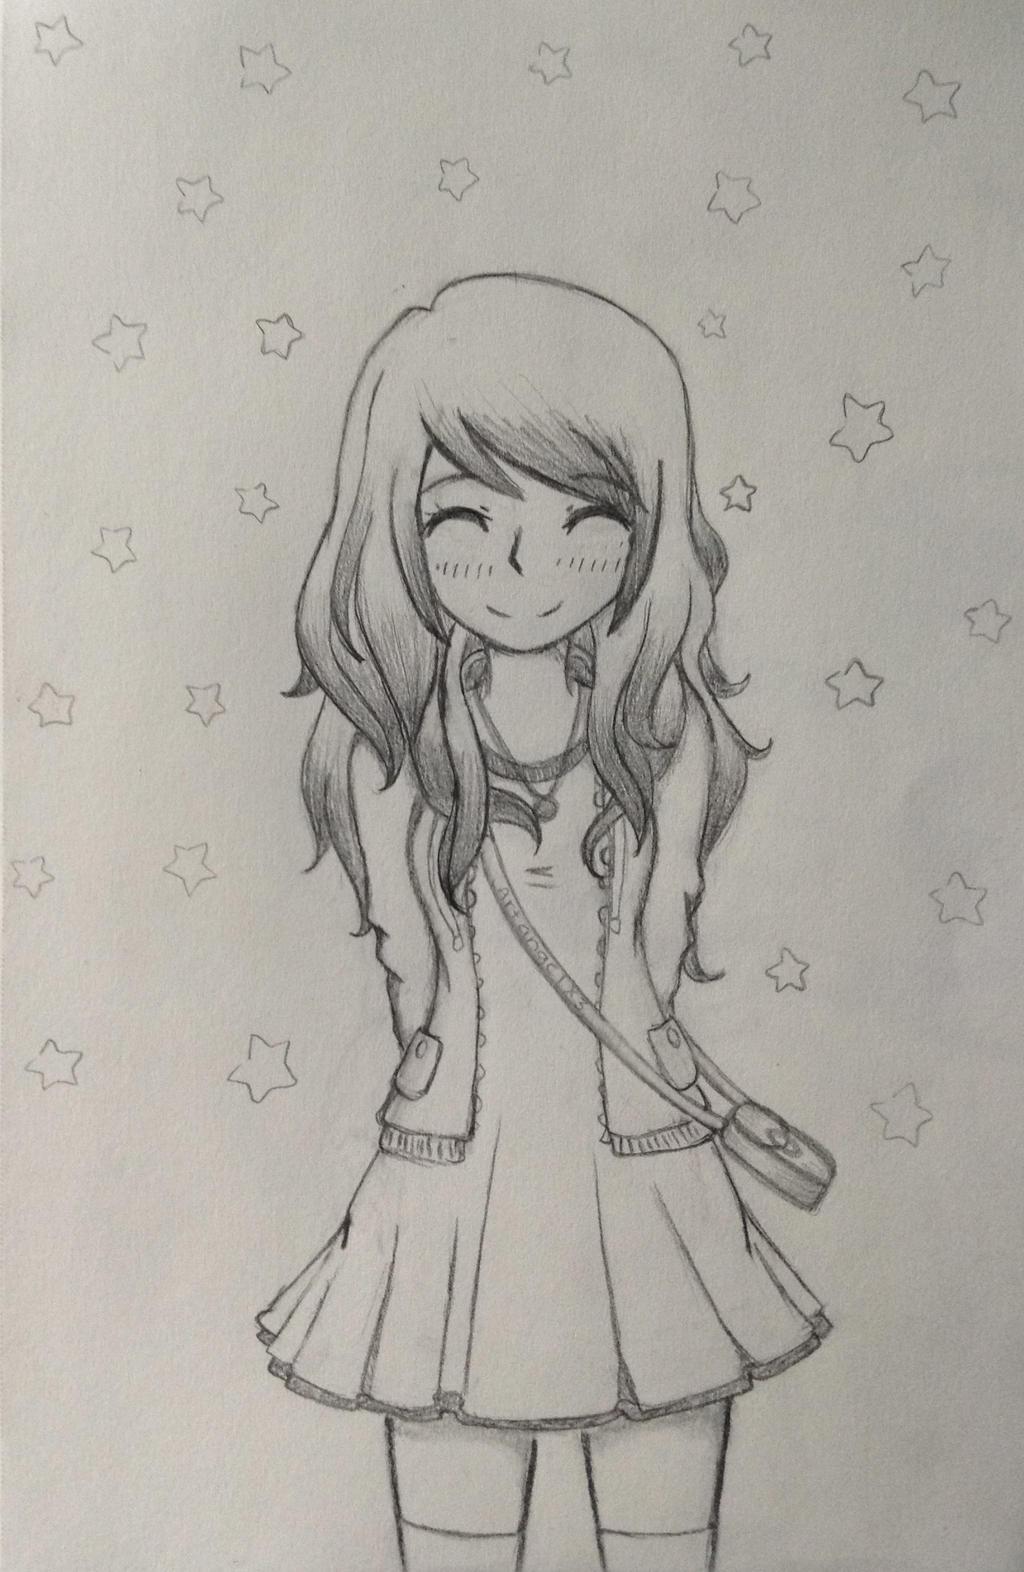 happy anime girl by artangelx3 on deviantART